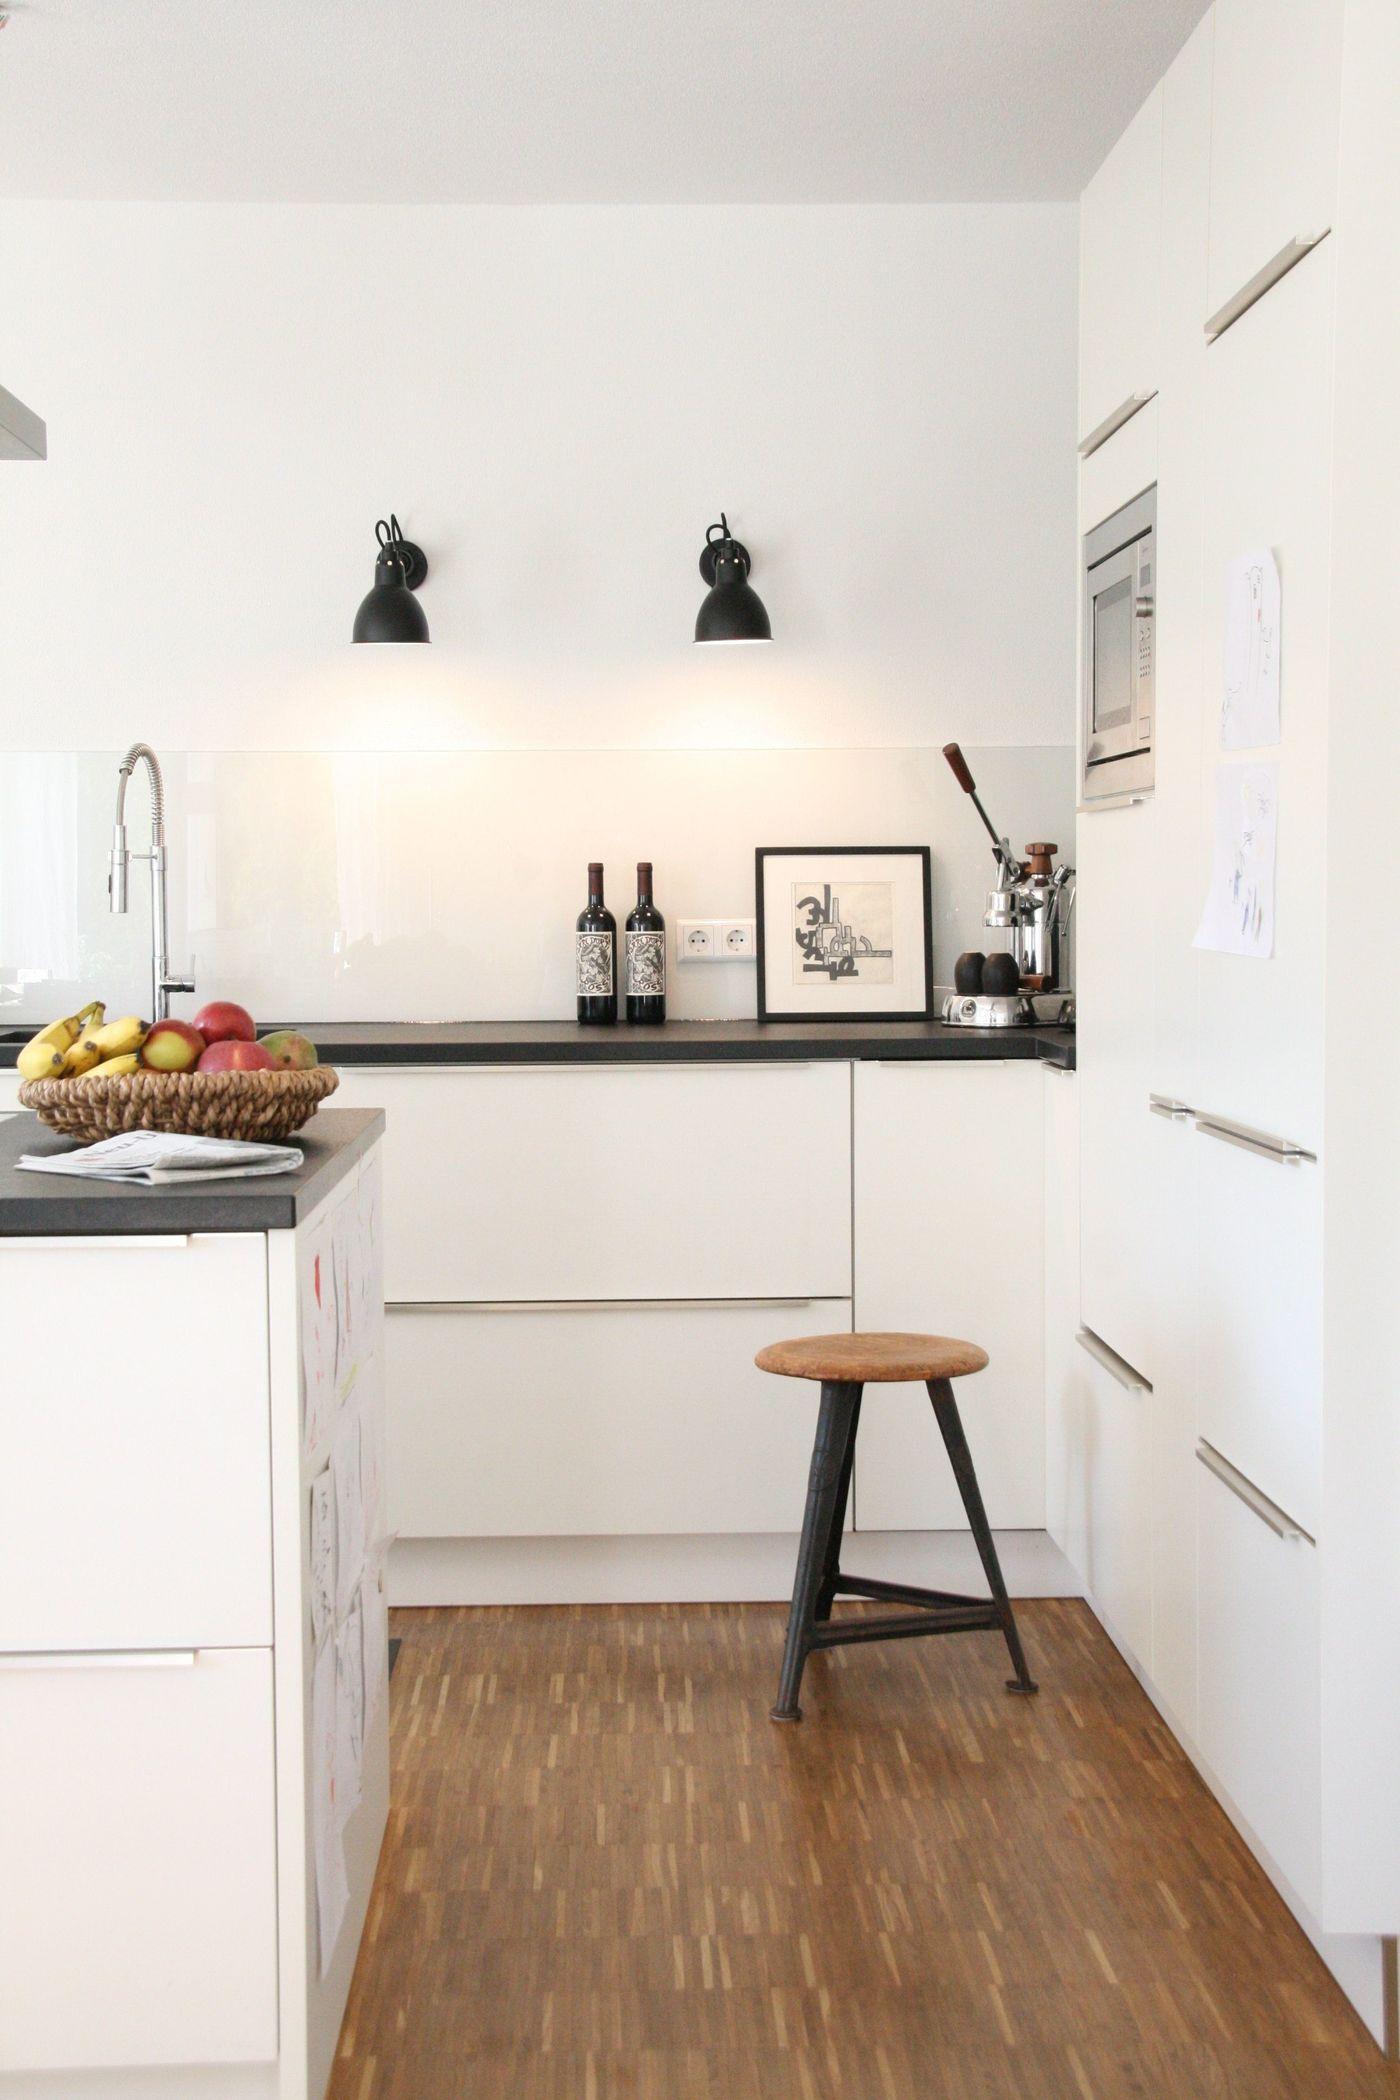 do it yourself ideen f r dein zuhause seite 54. Black Bedroom Furniture Sets. Home Design Ideas